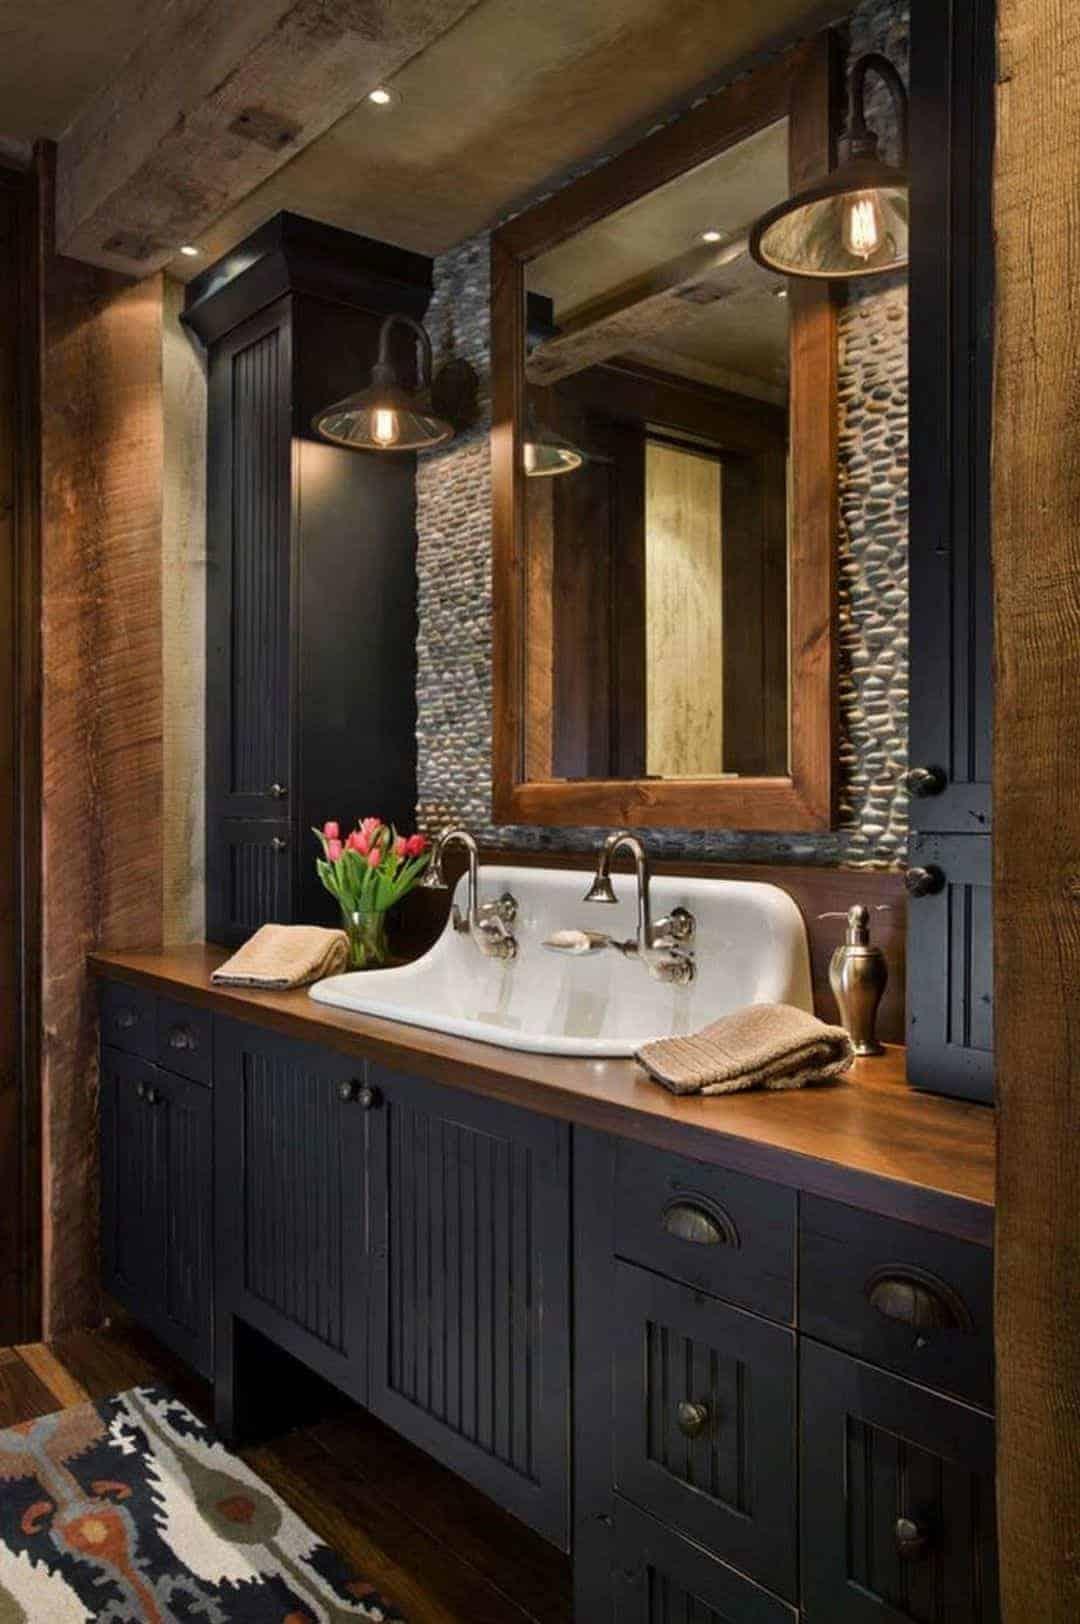 Emily Henderson Mountain Fixer Upper Rethink The Pebble Bathrooms Good Inspo Pics 15